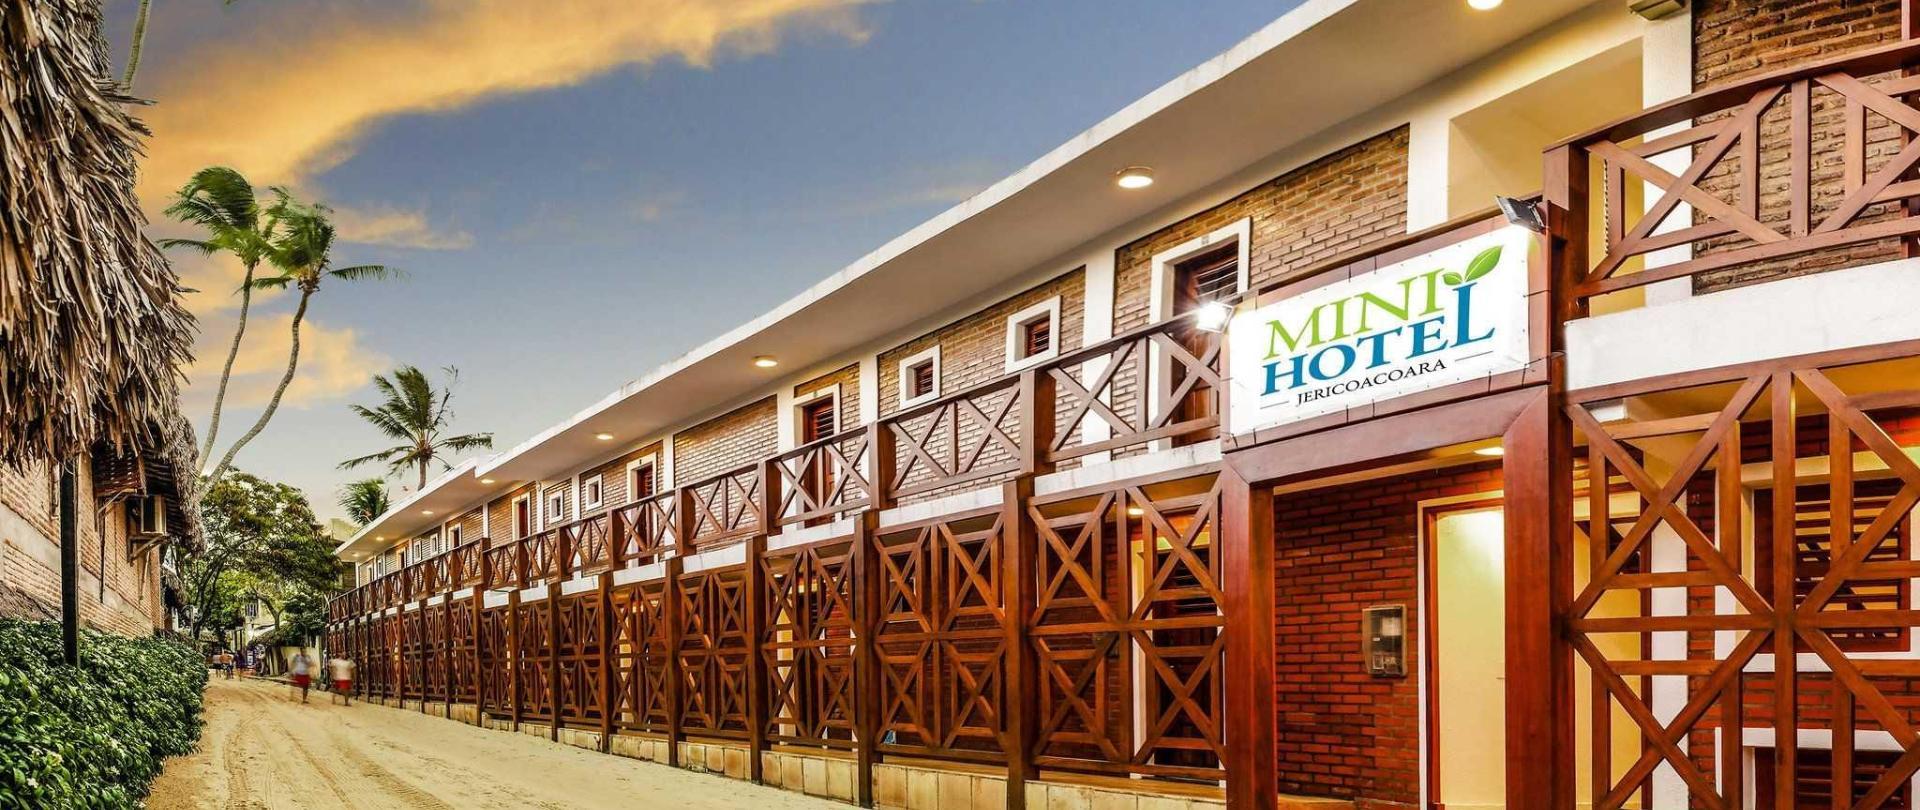 pn_mini_hotel_15.jpg